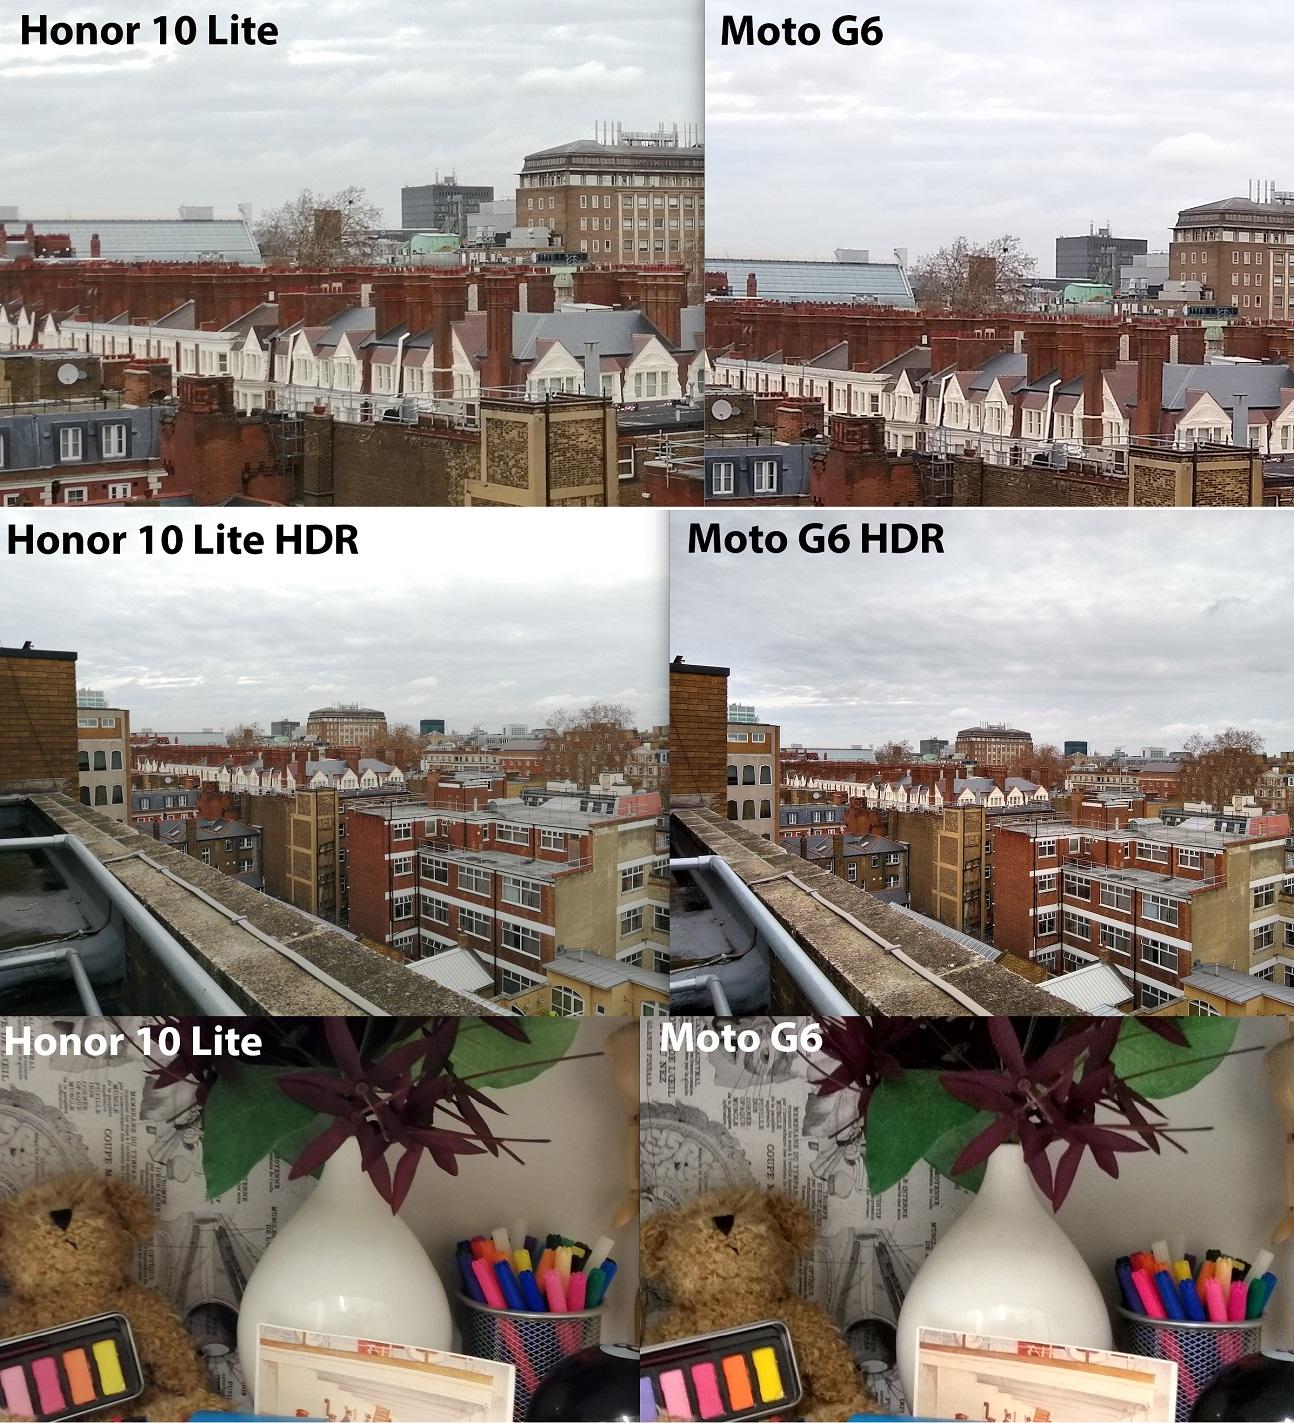 Honor 10 Lite Análisis cámara comparación